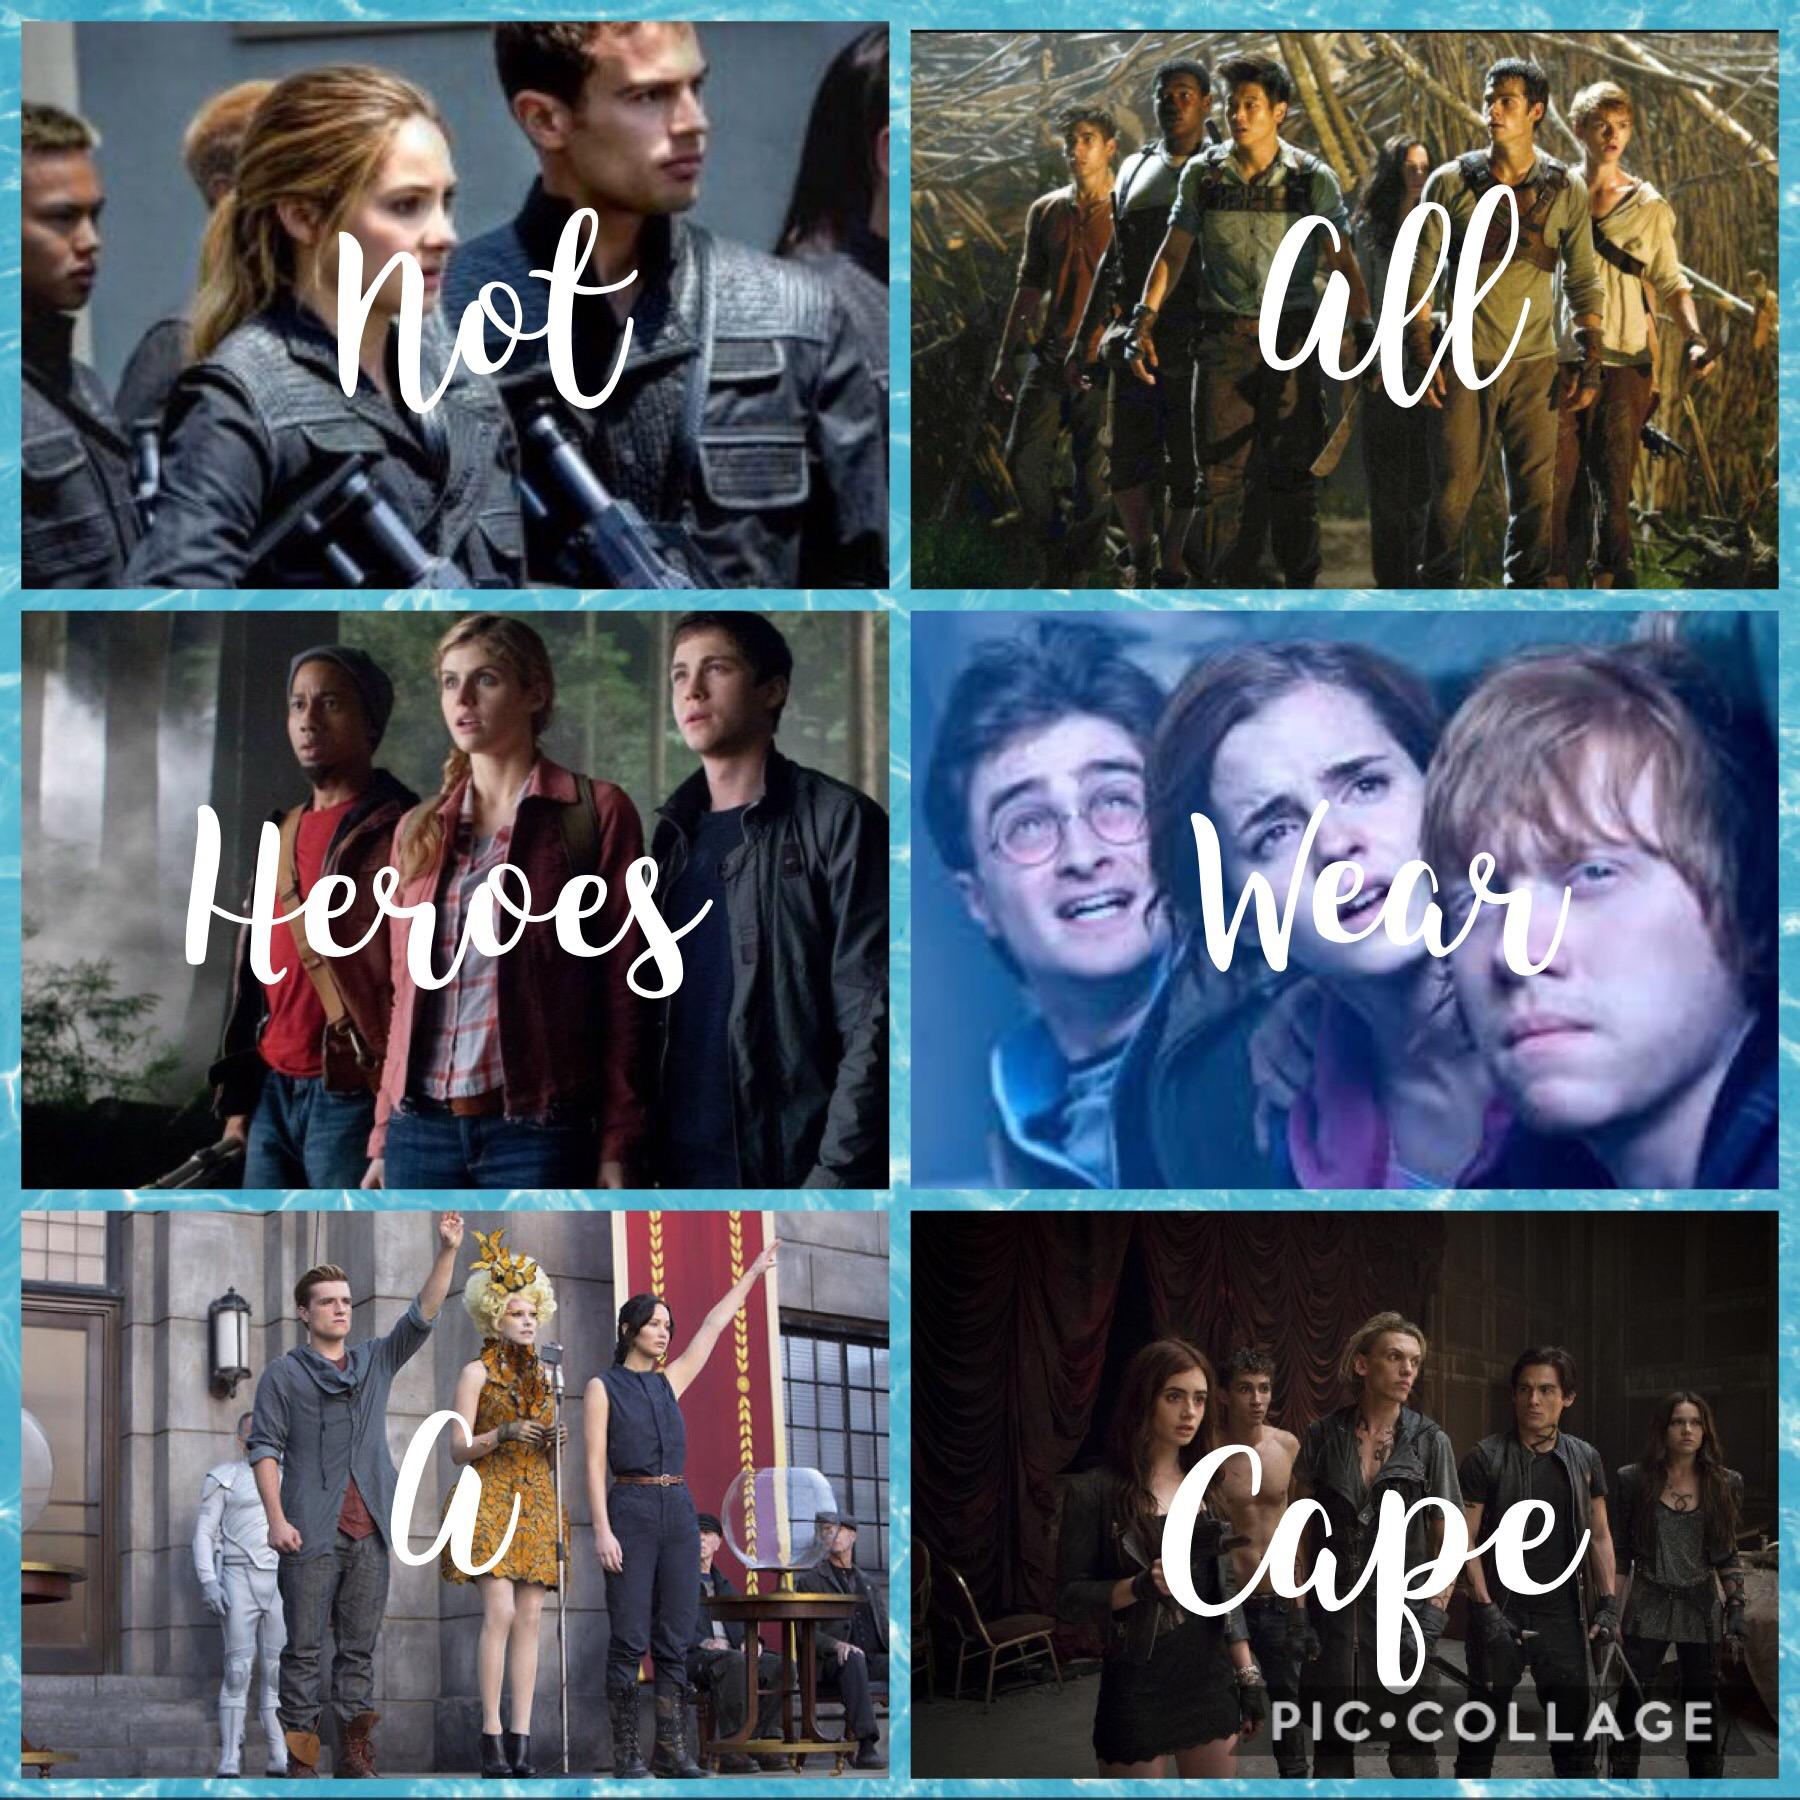 Wonderful Wallpaper Harry Potter Collage - fdb385559be55c1537ceda7d16c21164-beyond-imagination-41085483-1800-1800  Gallery_792966.jpg